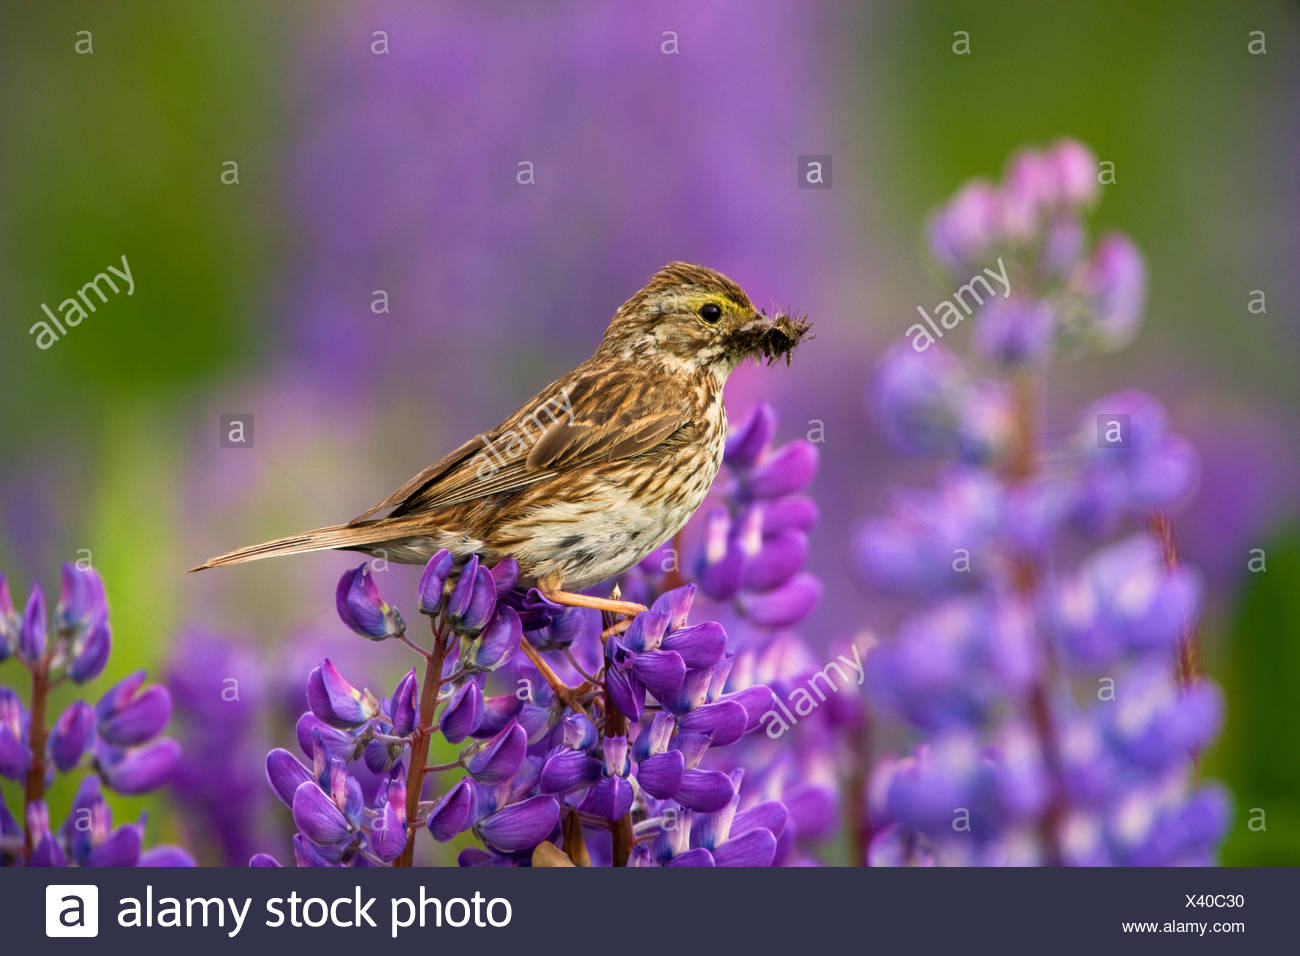 Savannah Sparrow on a nootka lupine, Chugach National Forest, near Seward, Alaska - Stock Image